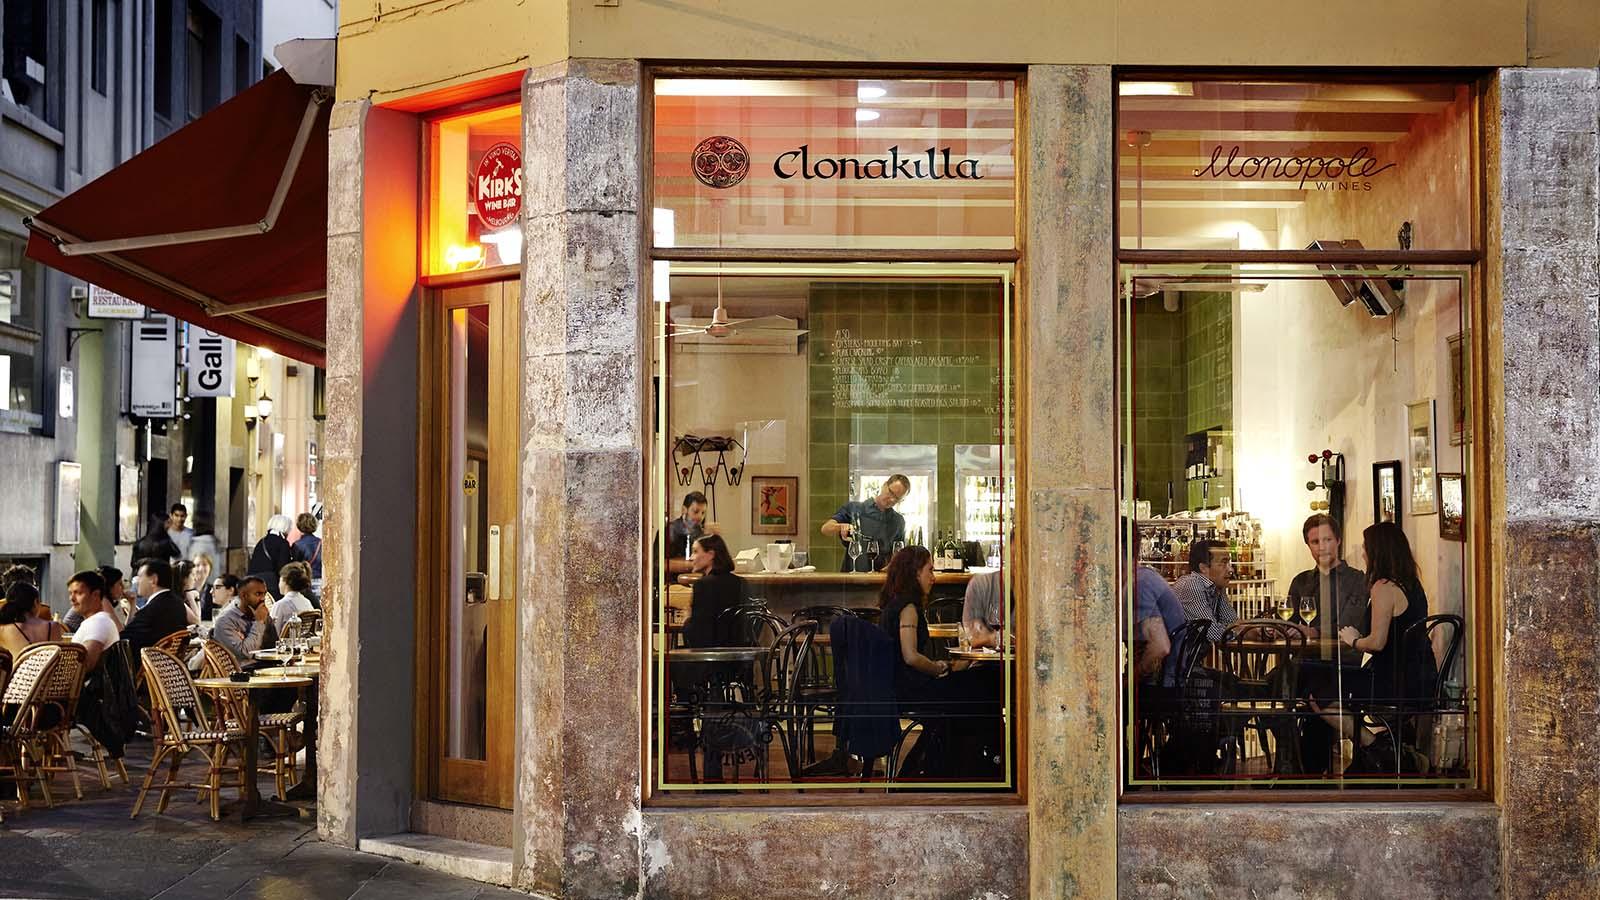 Bars food and wine melbourne victoria australia - Picture of bar ...